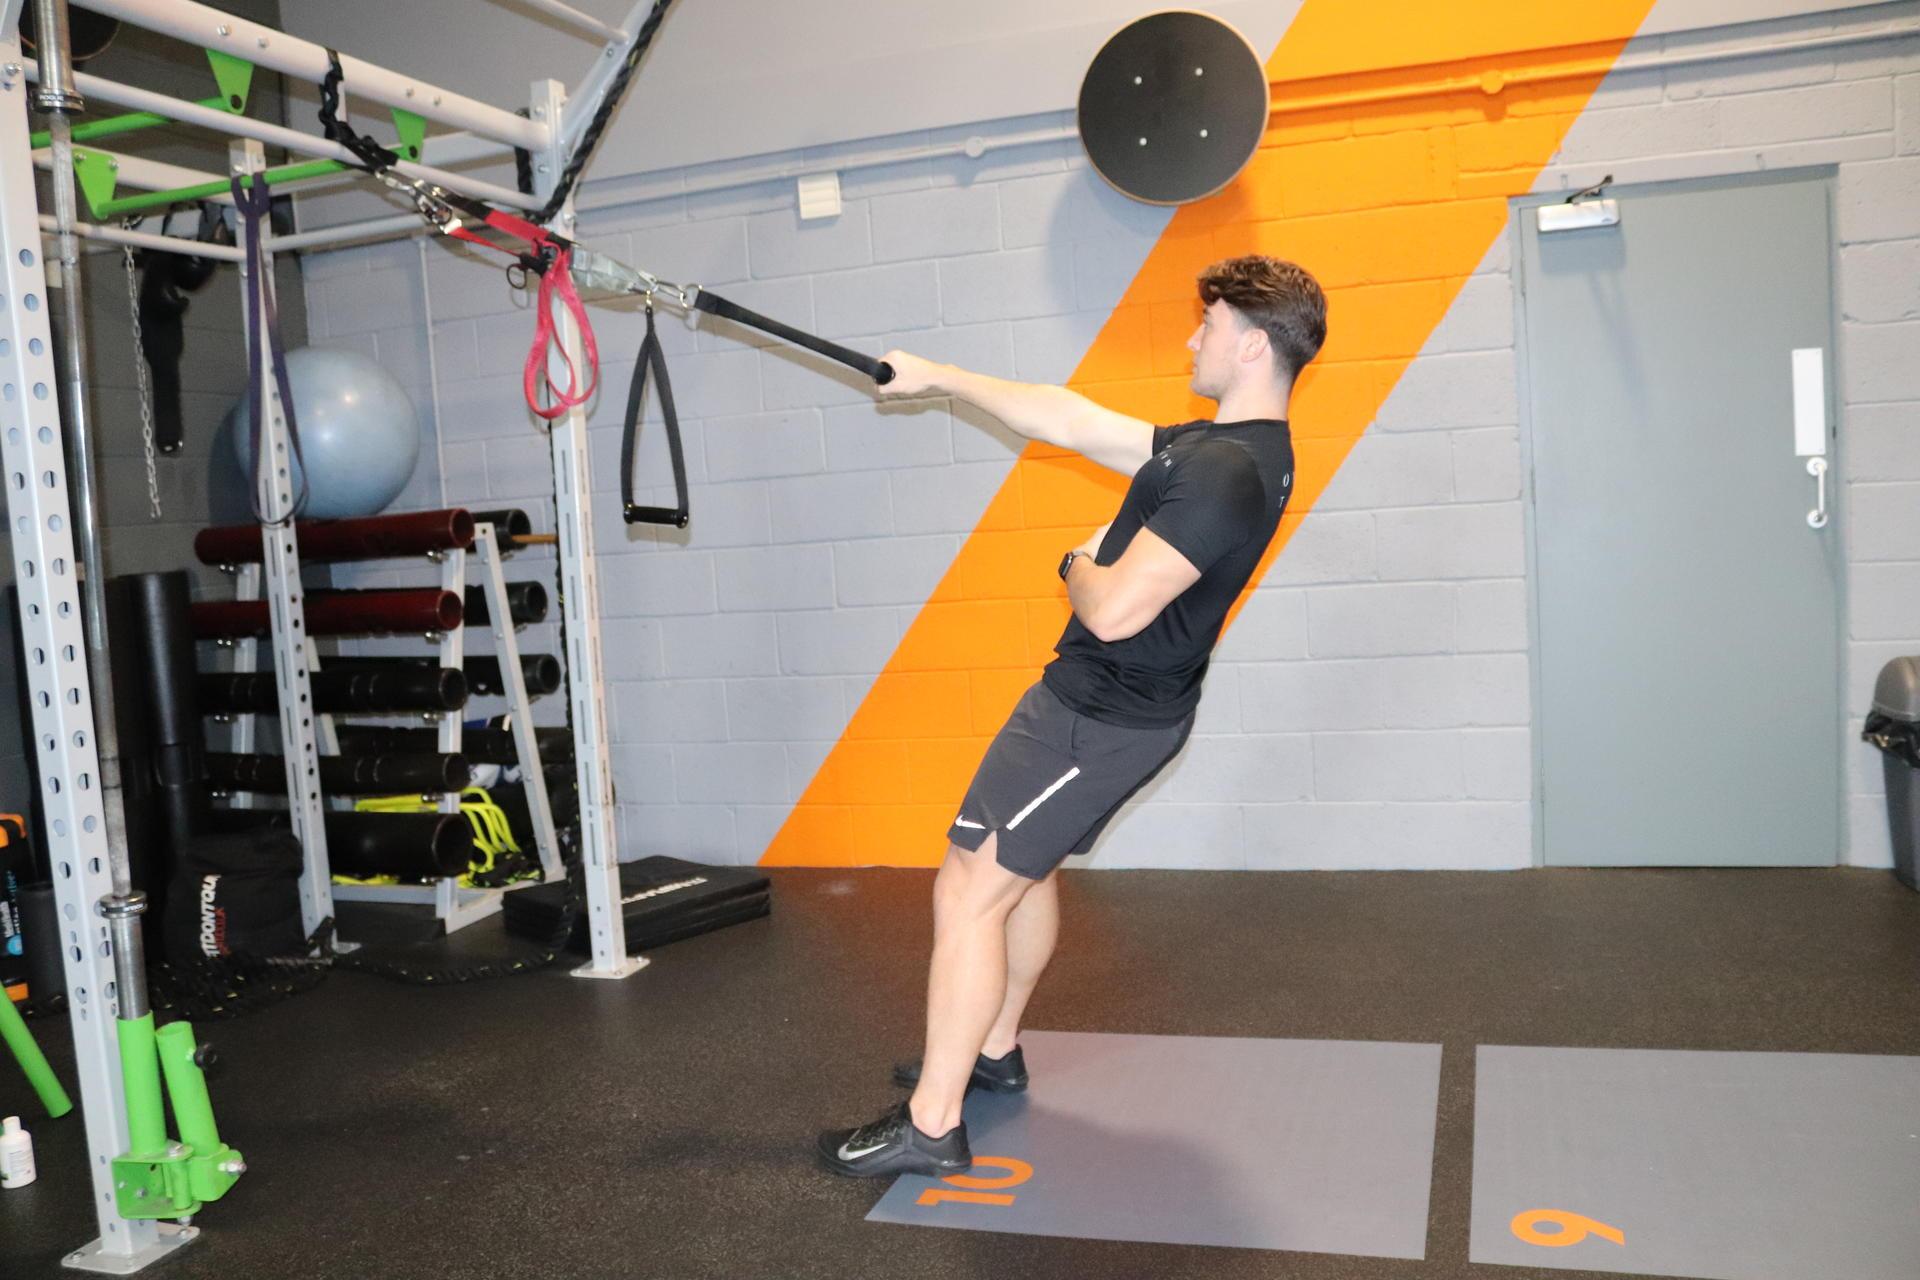 trx training exercise video